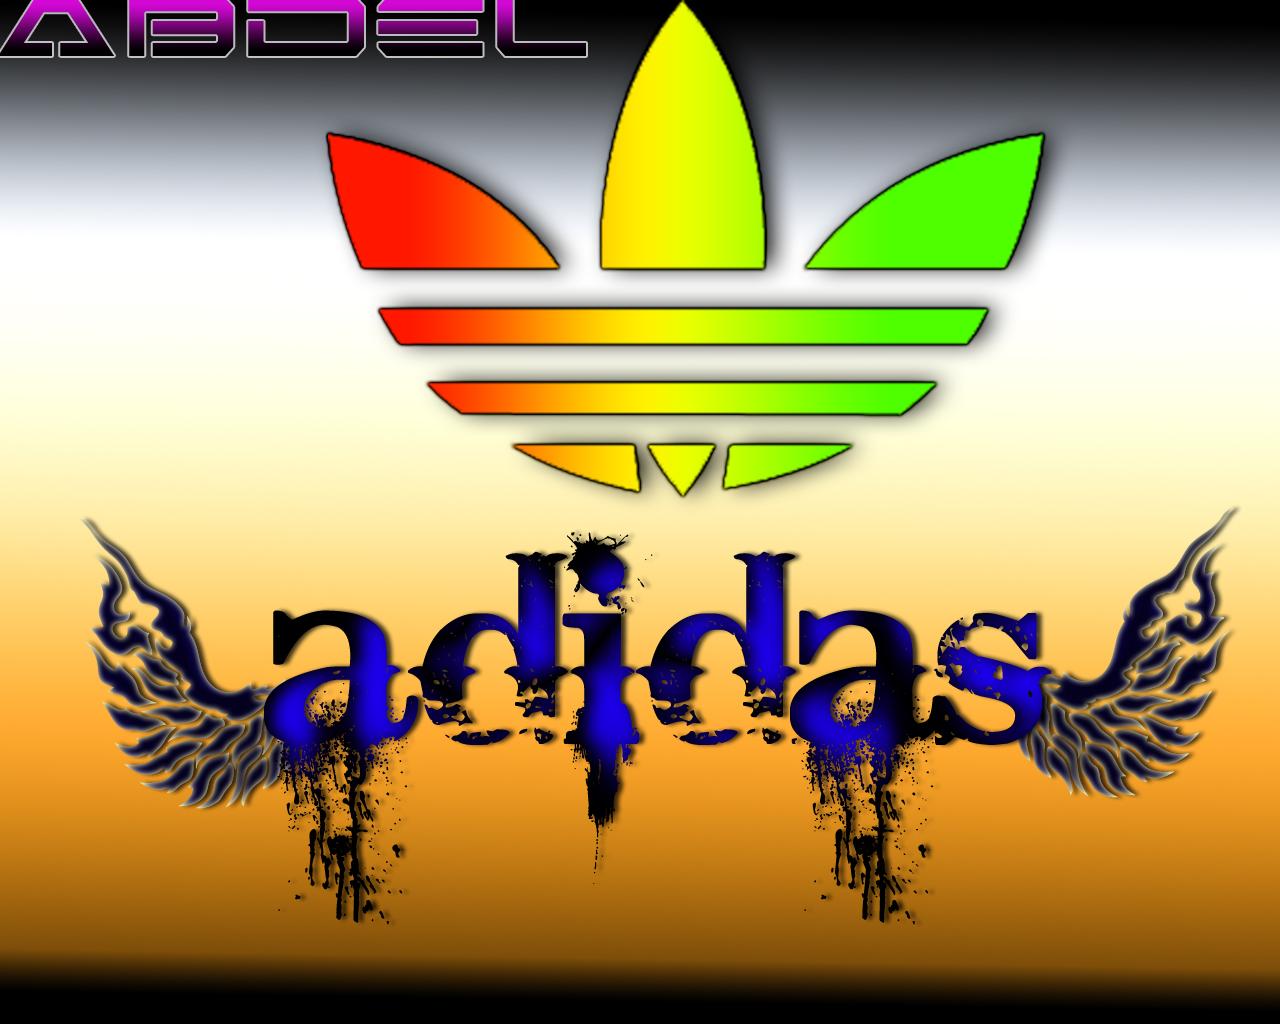 Wallpapers Brands - Advertising Adidas adidas